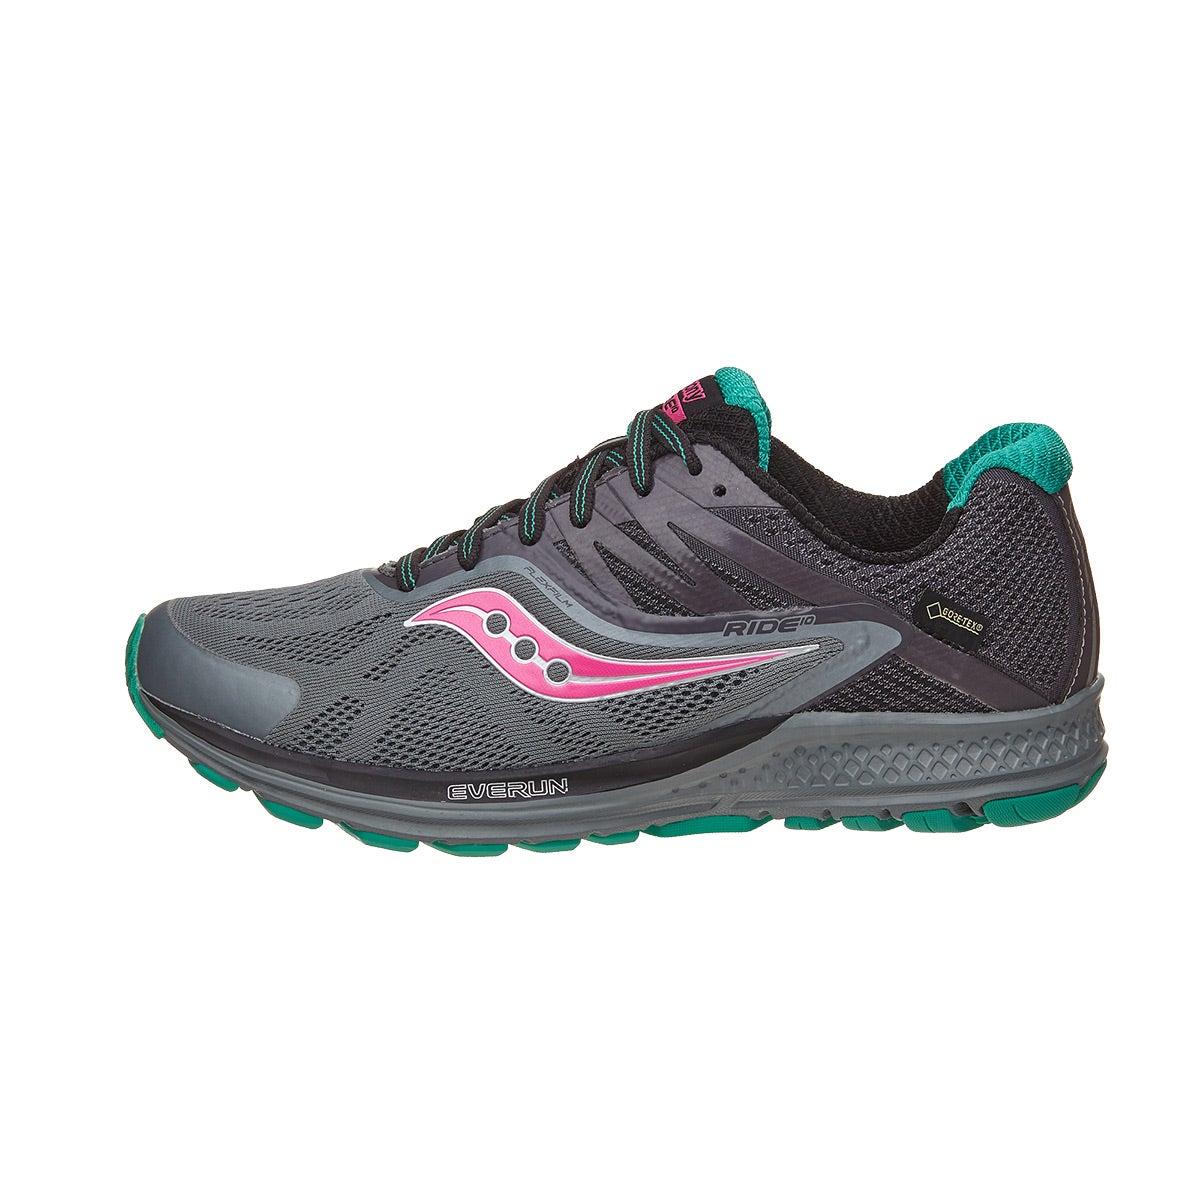 Saucony Ride 10 GTX Women's Shoes Grey